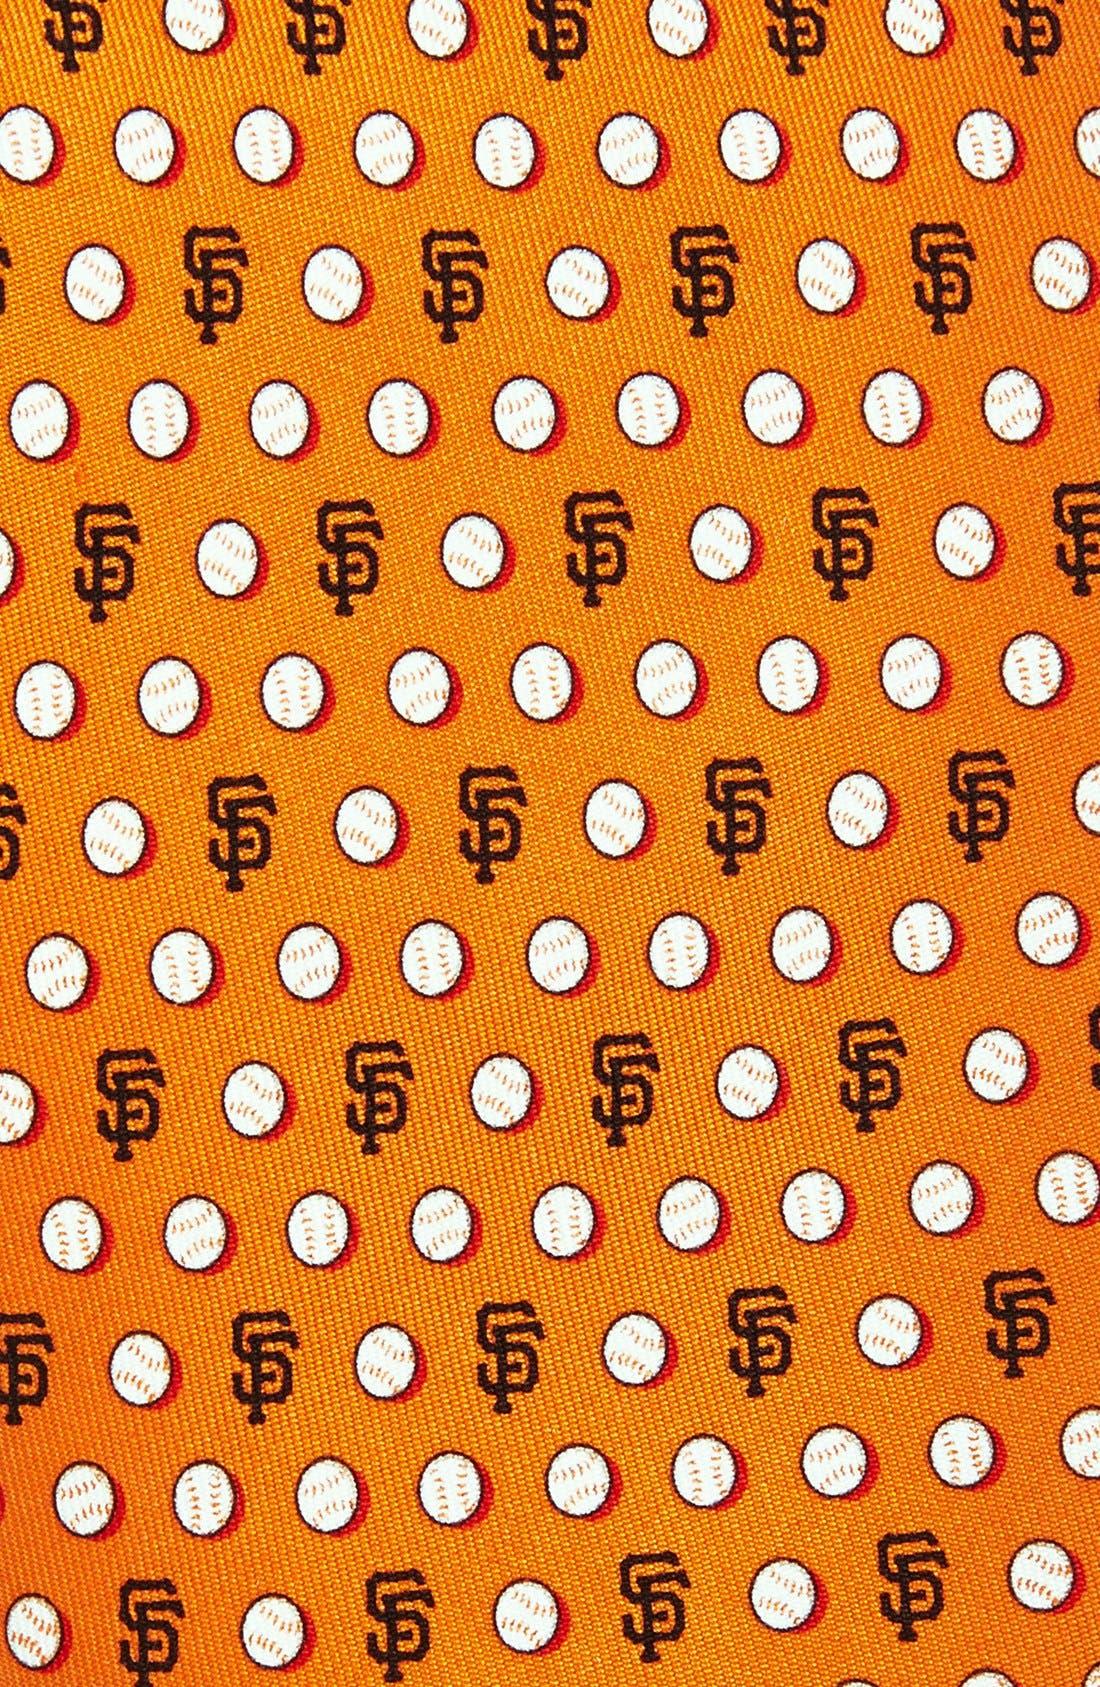 'San Francisco Giants - MLB' Woven Silk Tie,                             Alternate thumbnail 2, color,                             Orange